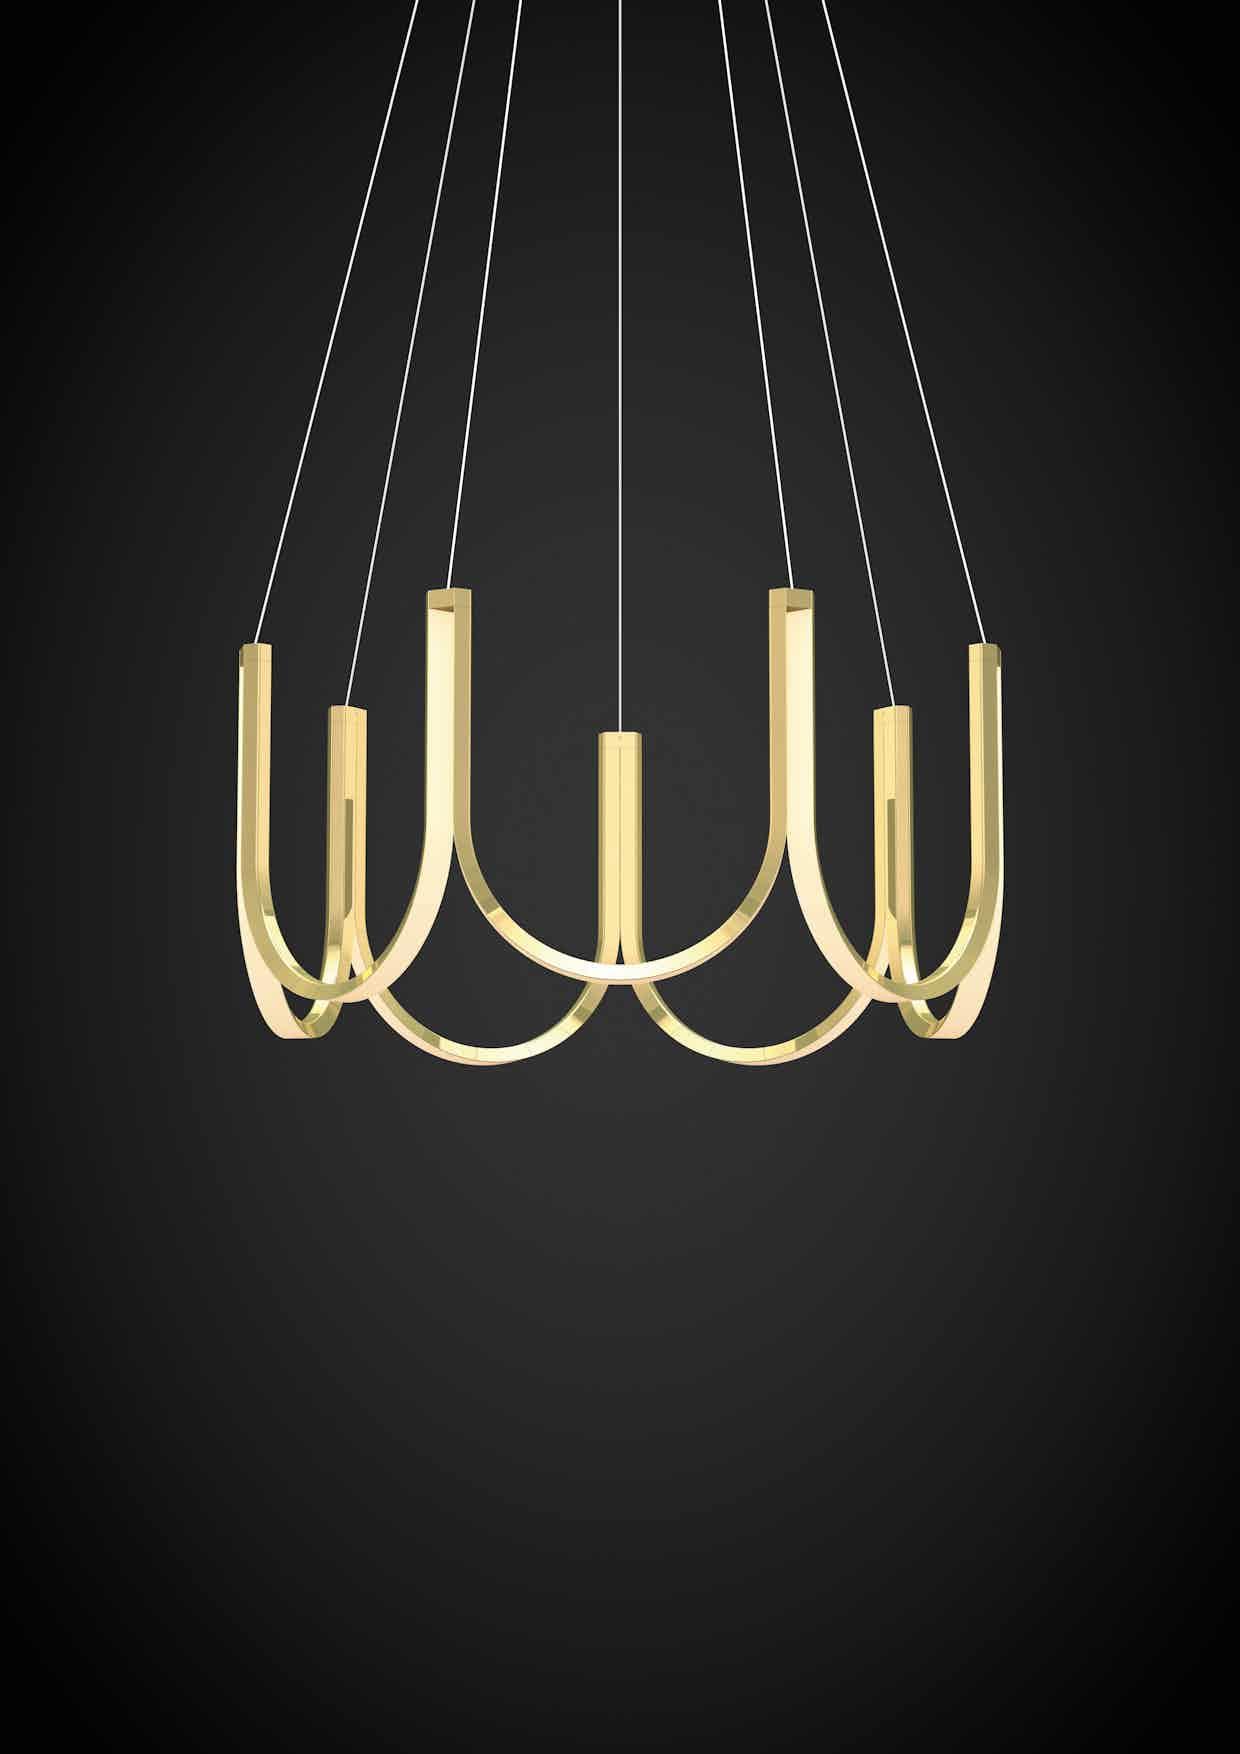 Arpel lighting u7 pendant brass haute living